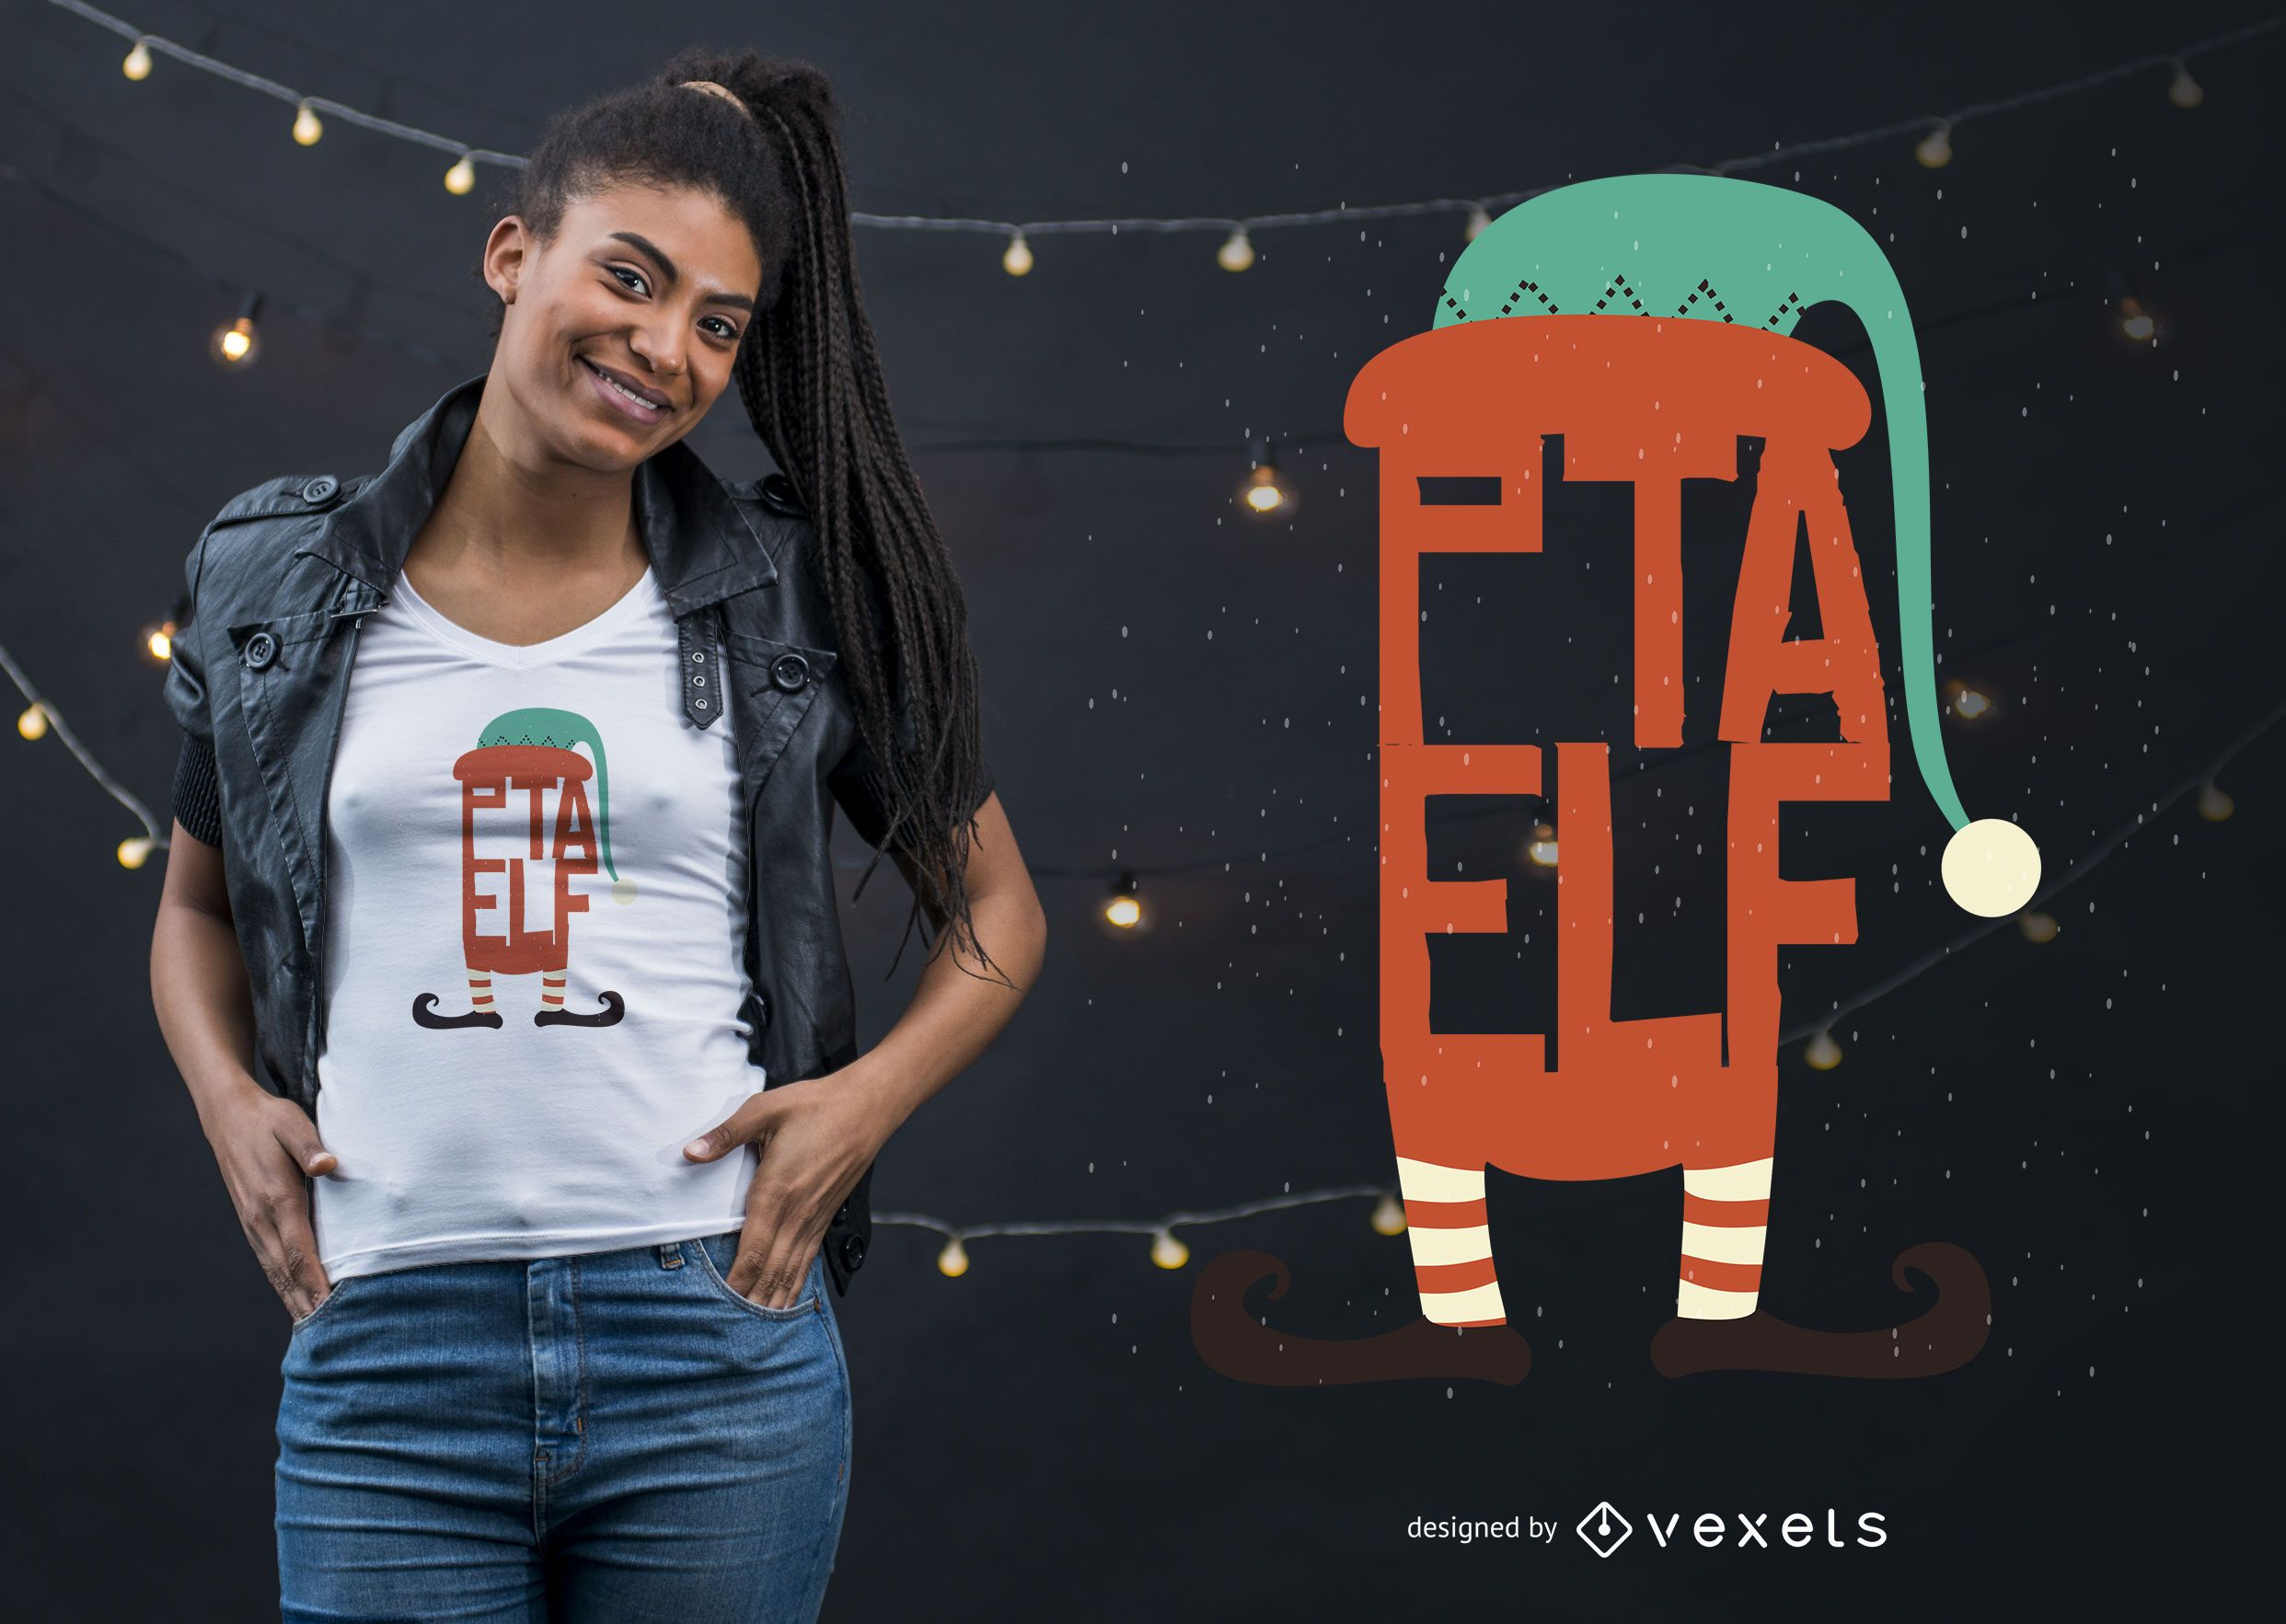 Diseño de camiseta de Elf PTA